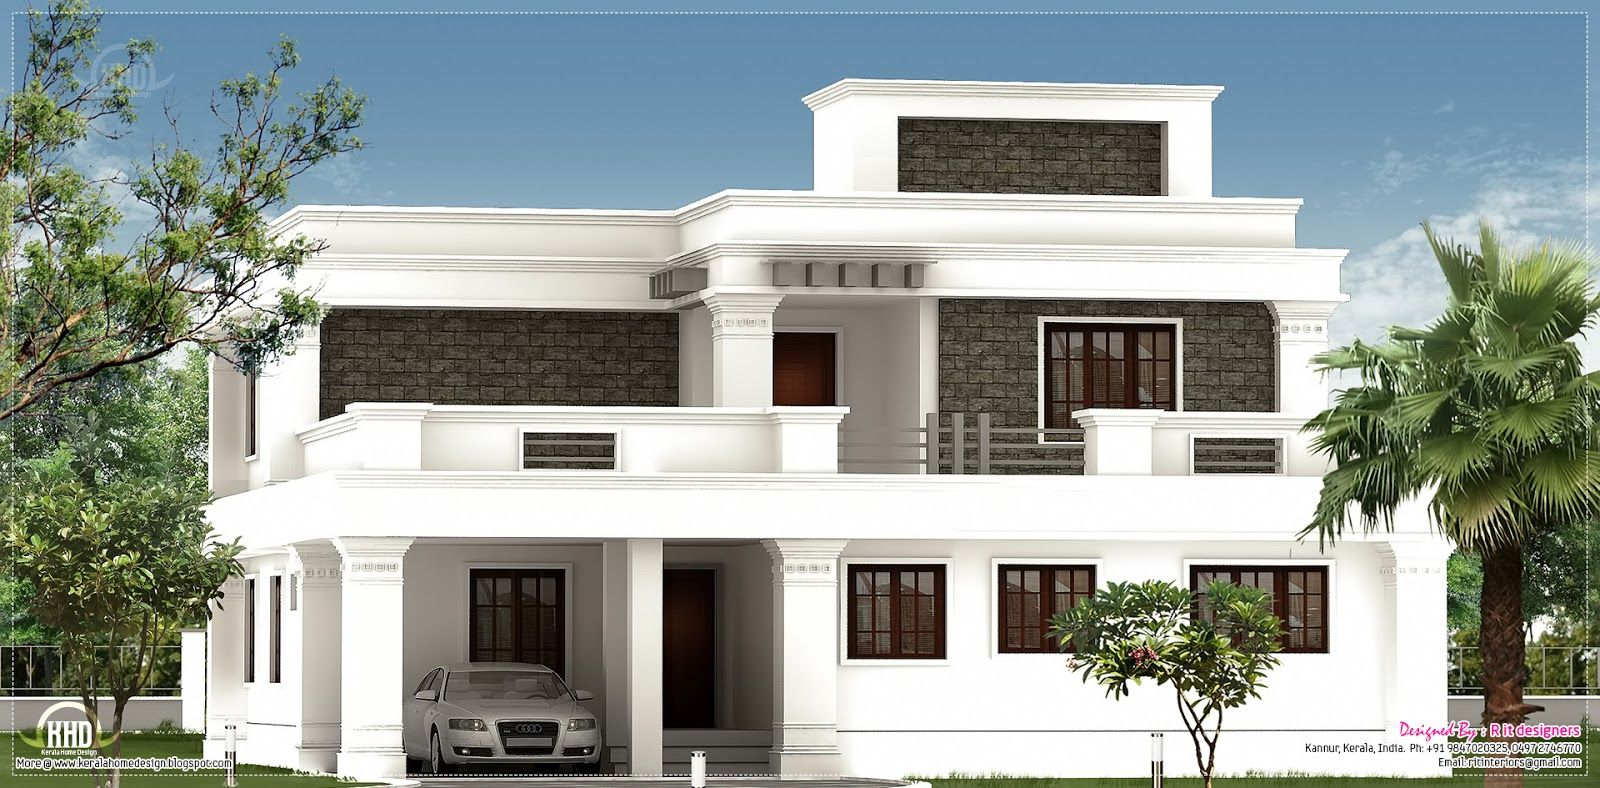 flat roof homes designs   Flat roof villa exterior in 2400 ...